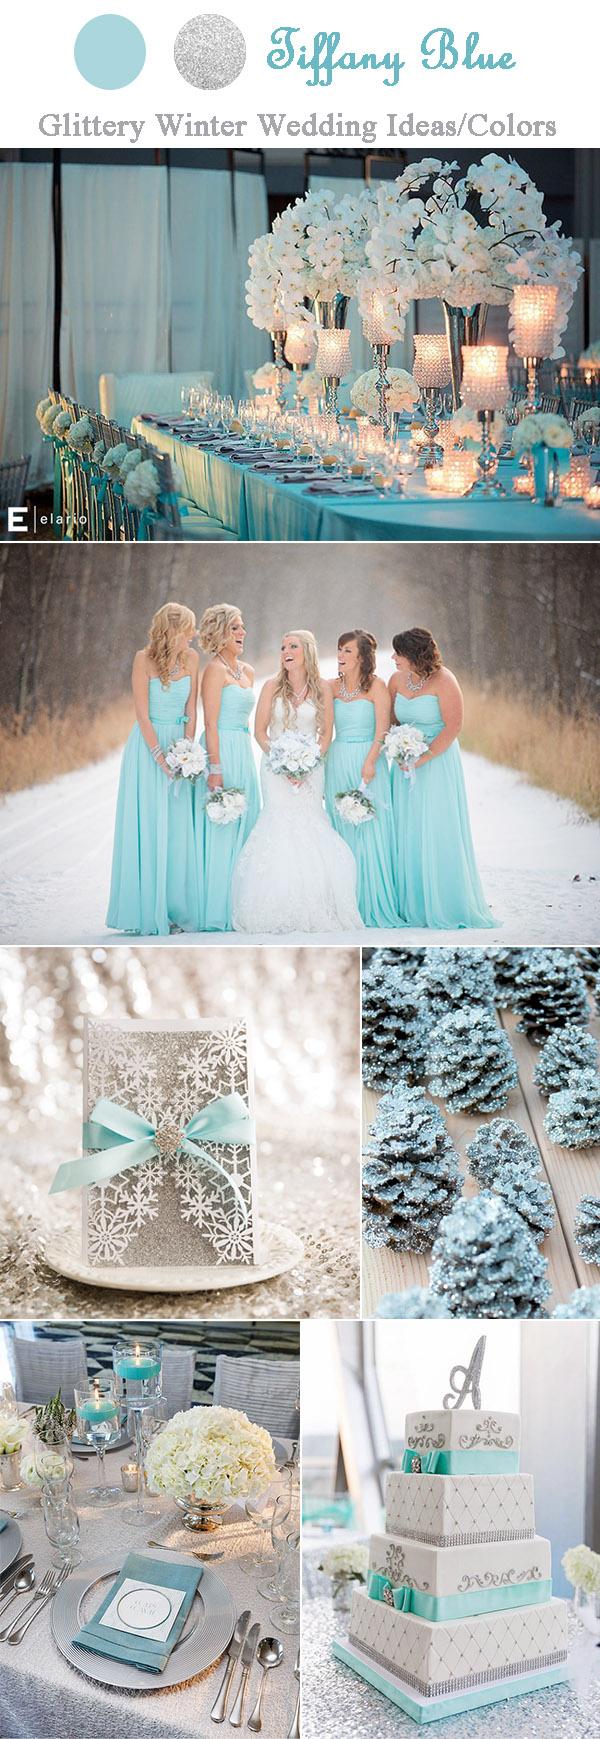 Winter Wedding Ideas 35 Breathtaking Winter Wonderland Inspired Wedding Ideas